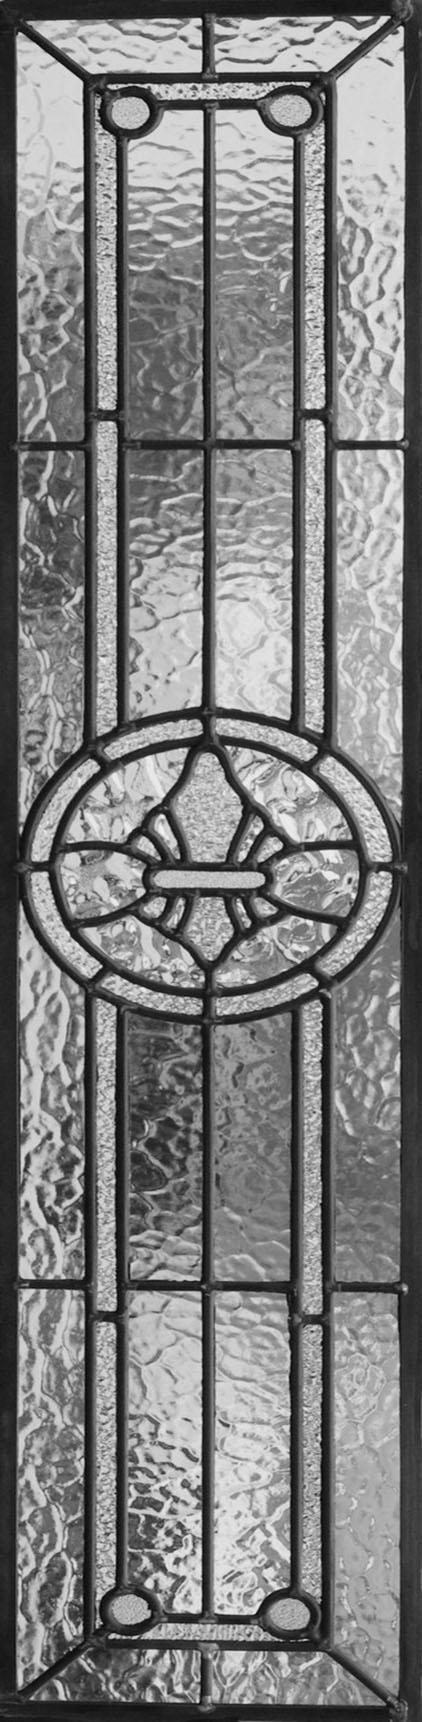 Shield & Leadlight Glass Panelling in Heritage Doors | Statesman Doors